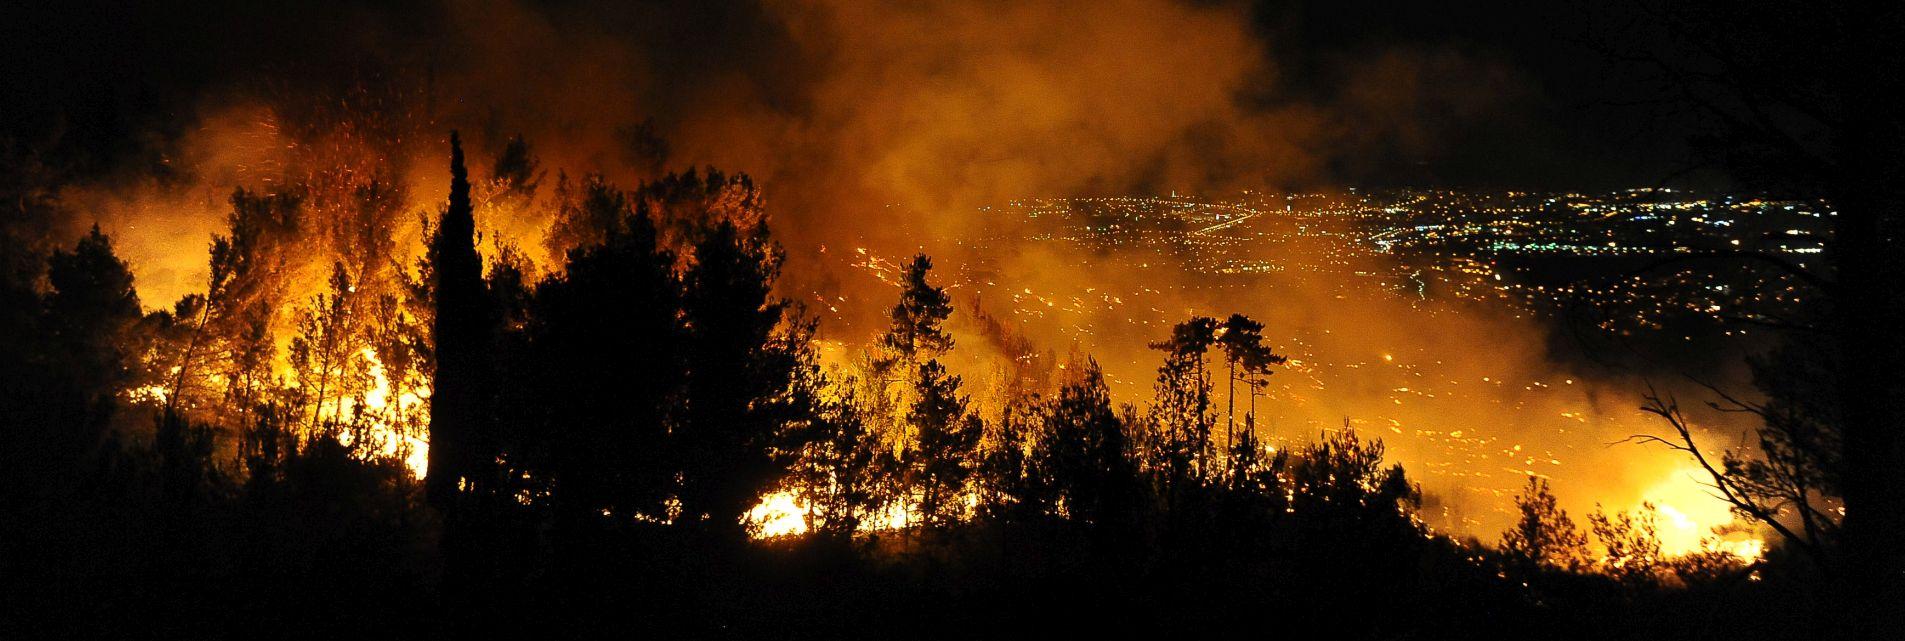 78 VATROGASACA Požar u Rupotini ugašen – izgorjelo 10 hektara